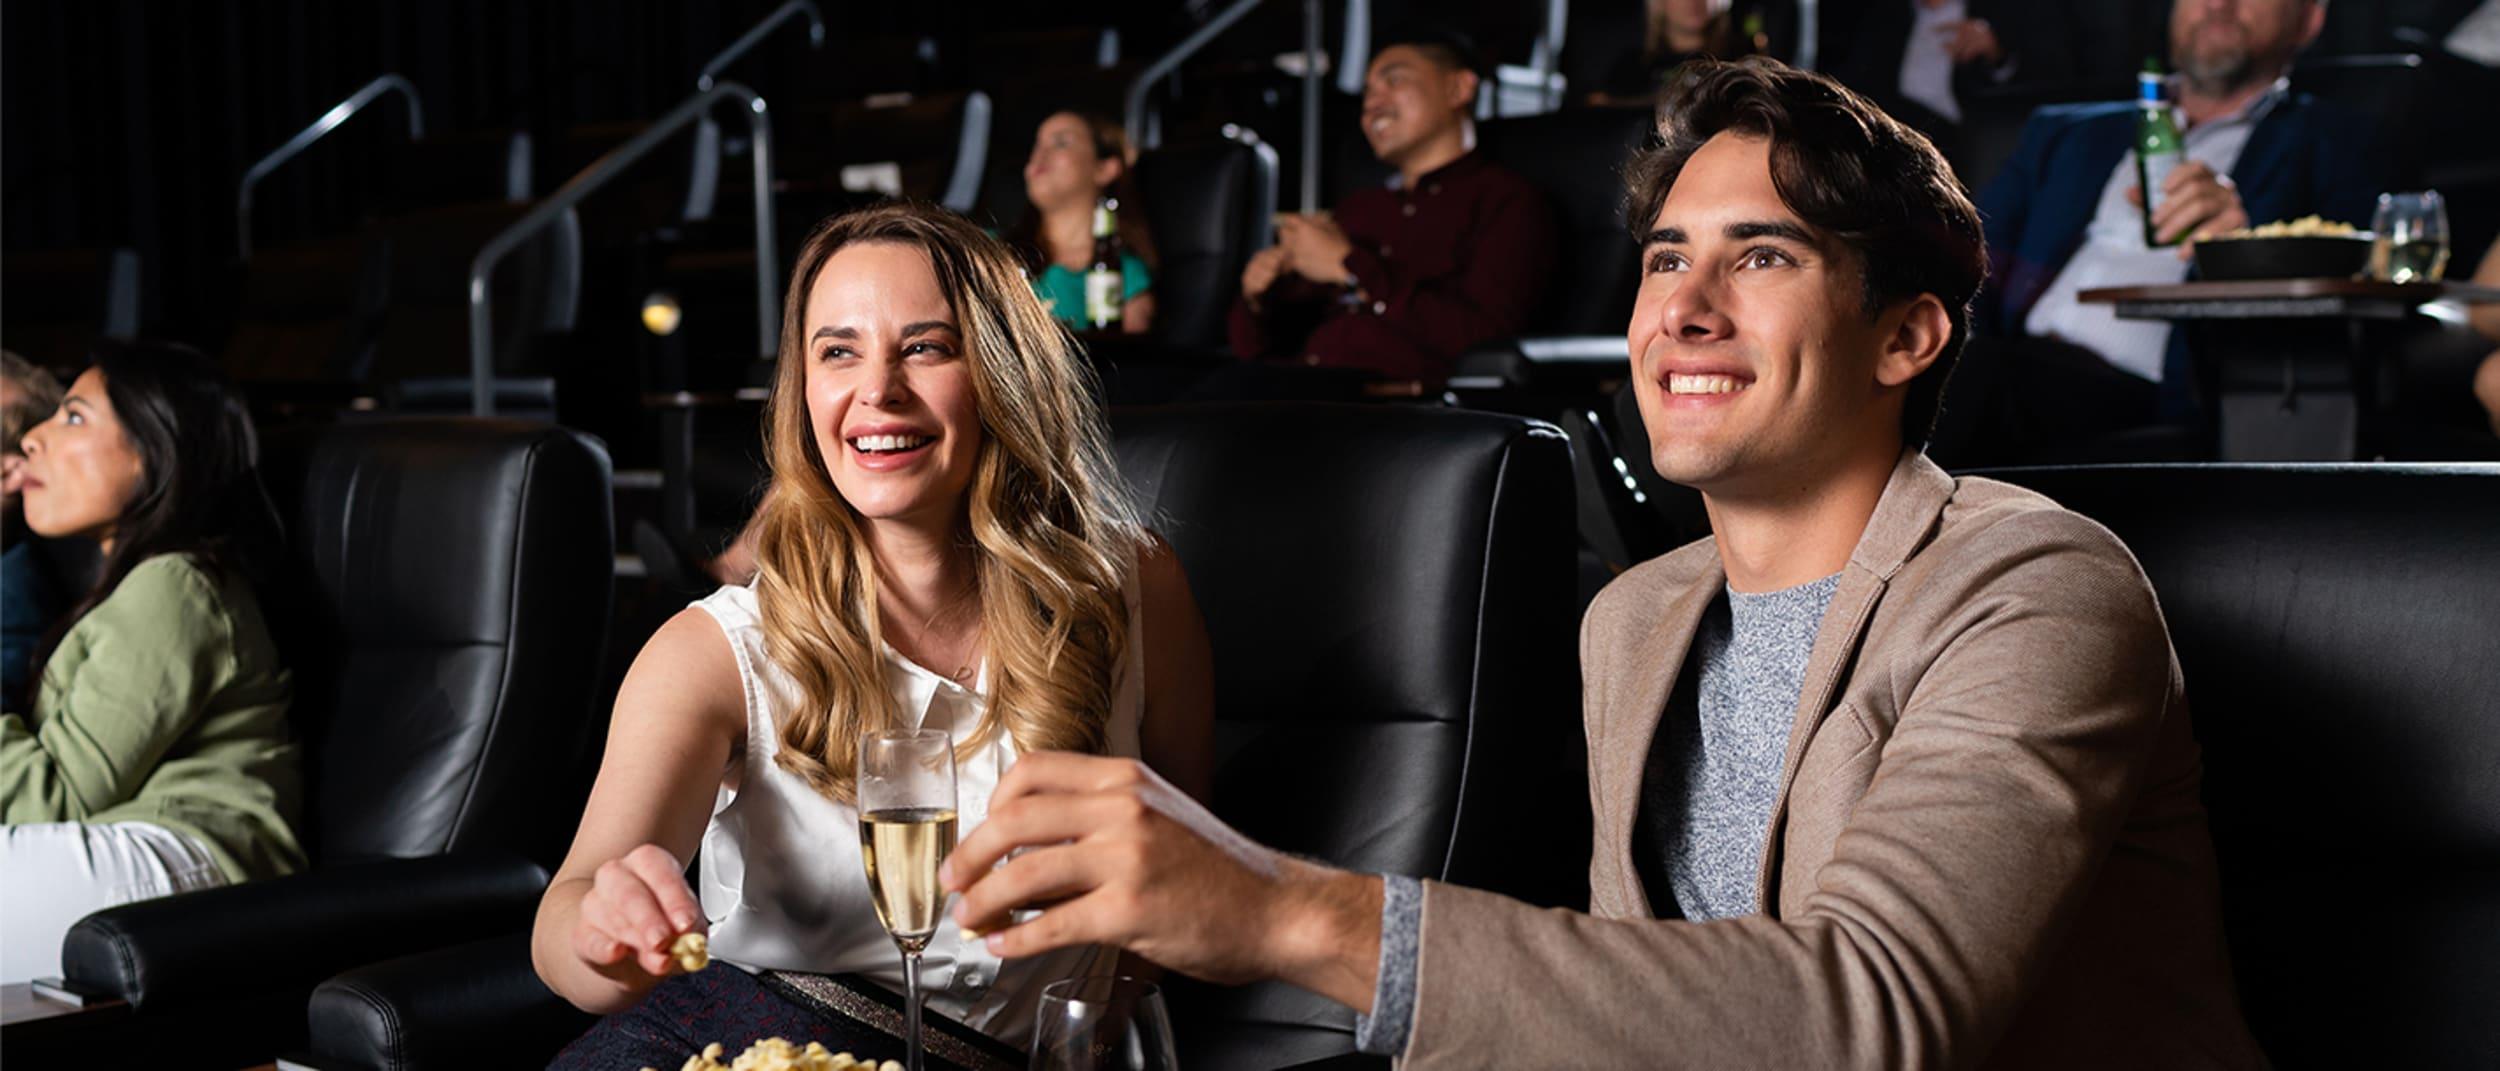 Valet & Event Cinema | Park and redeem your $10 bar voucher